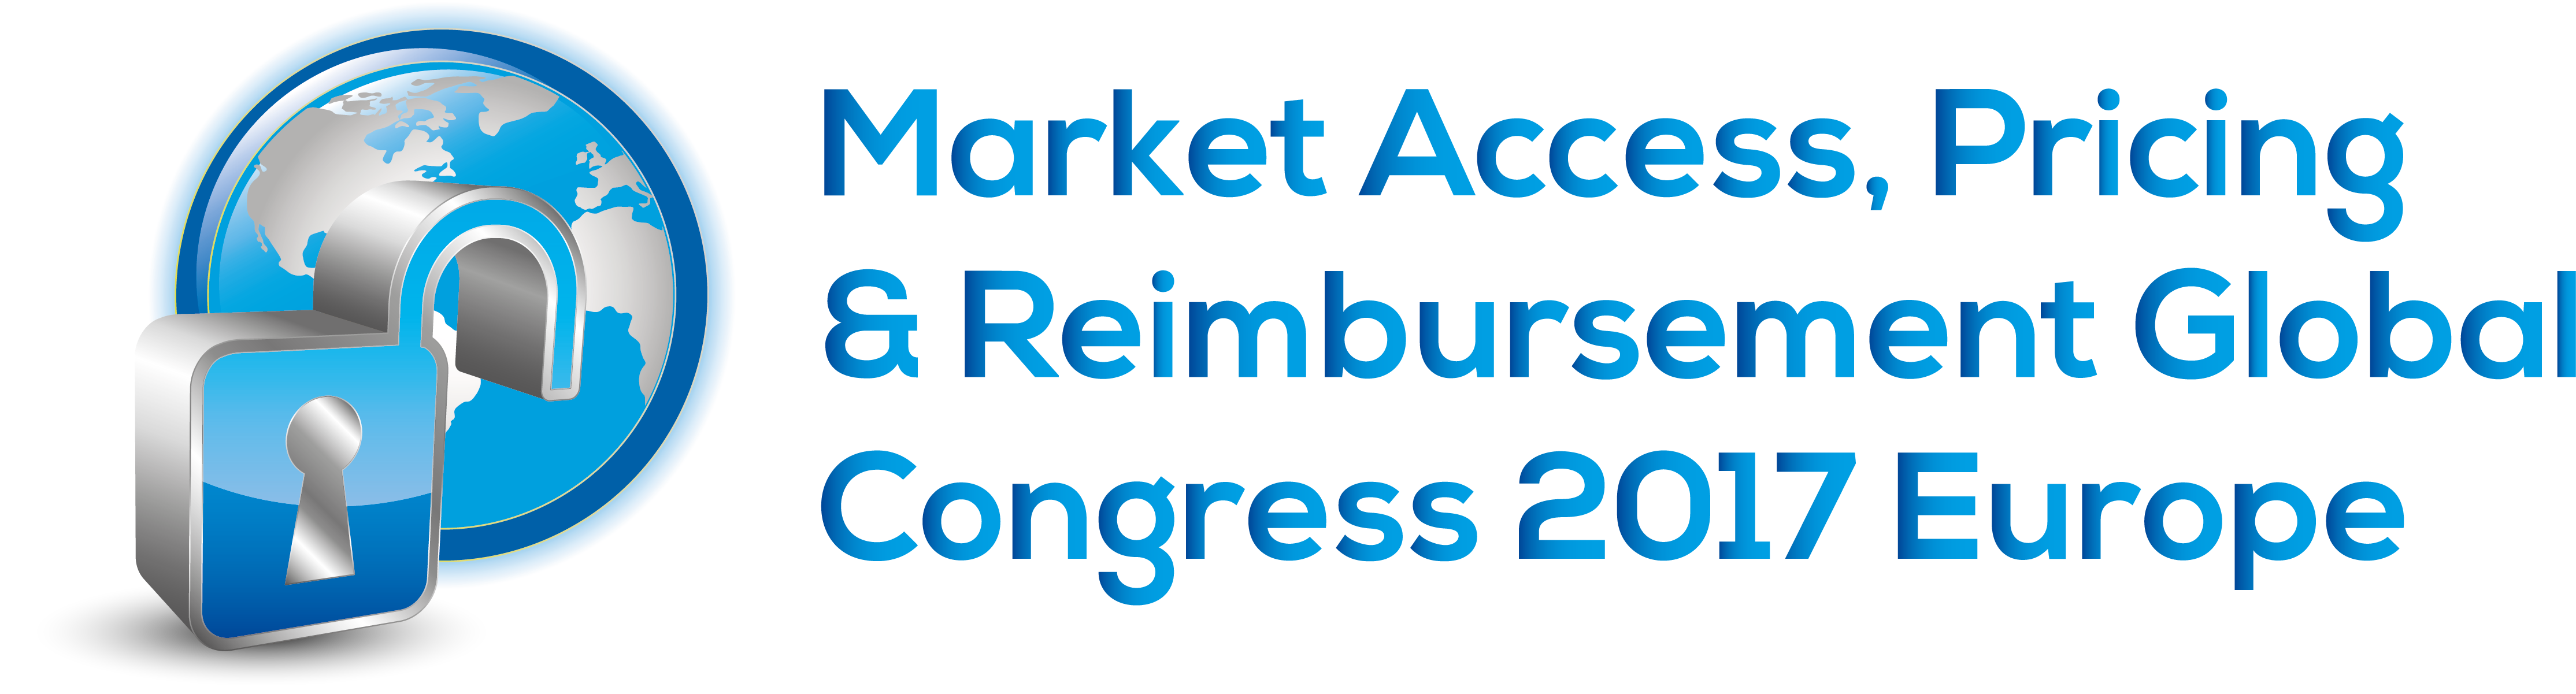 Market Access Logo